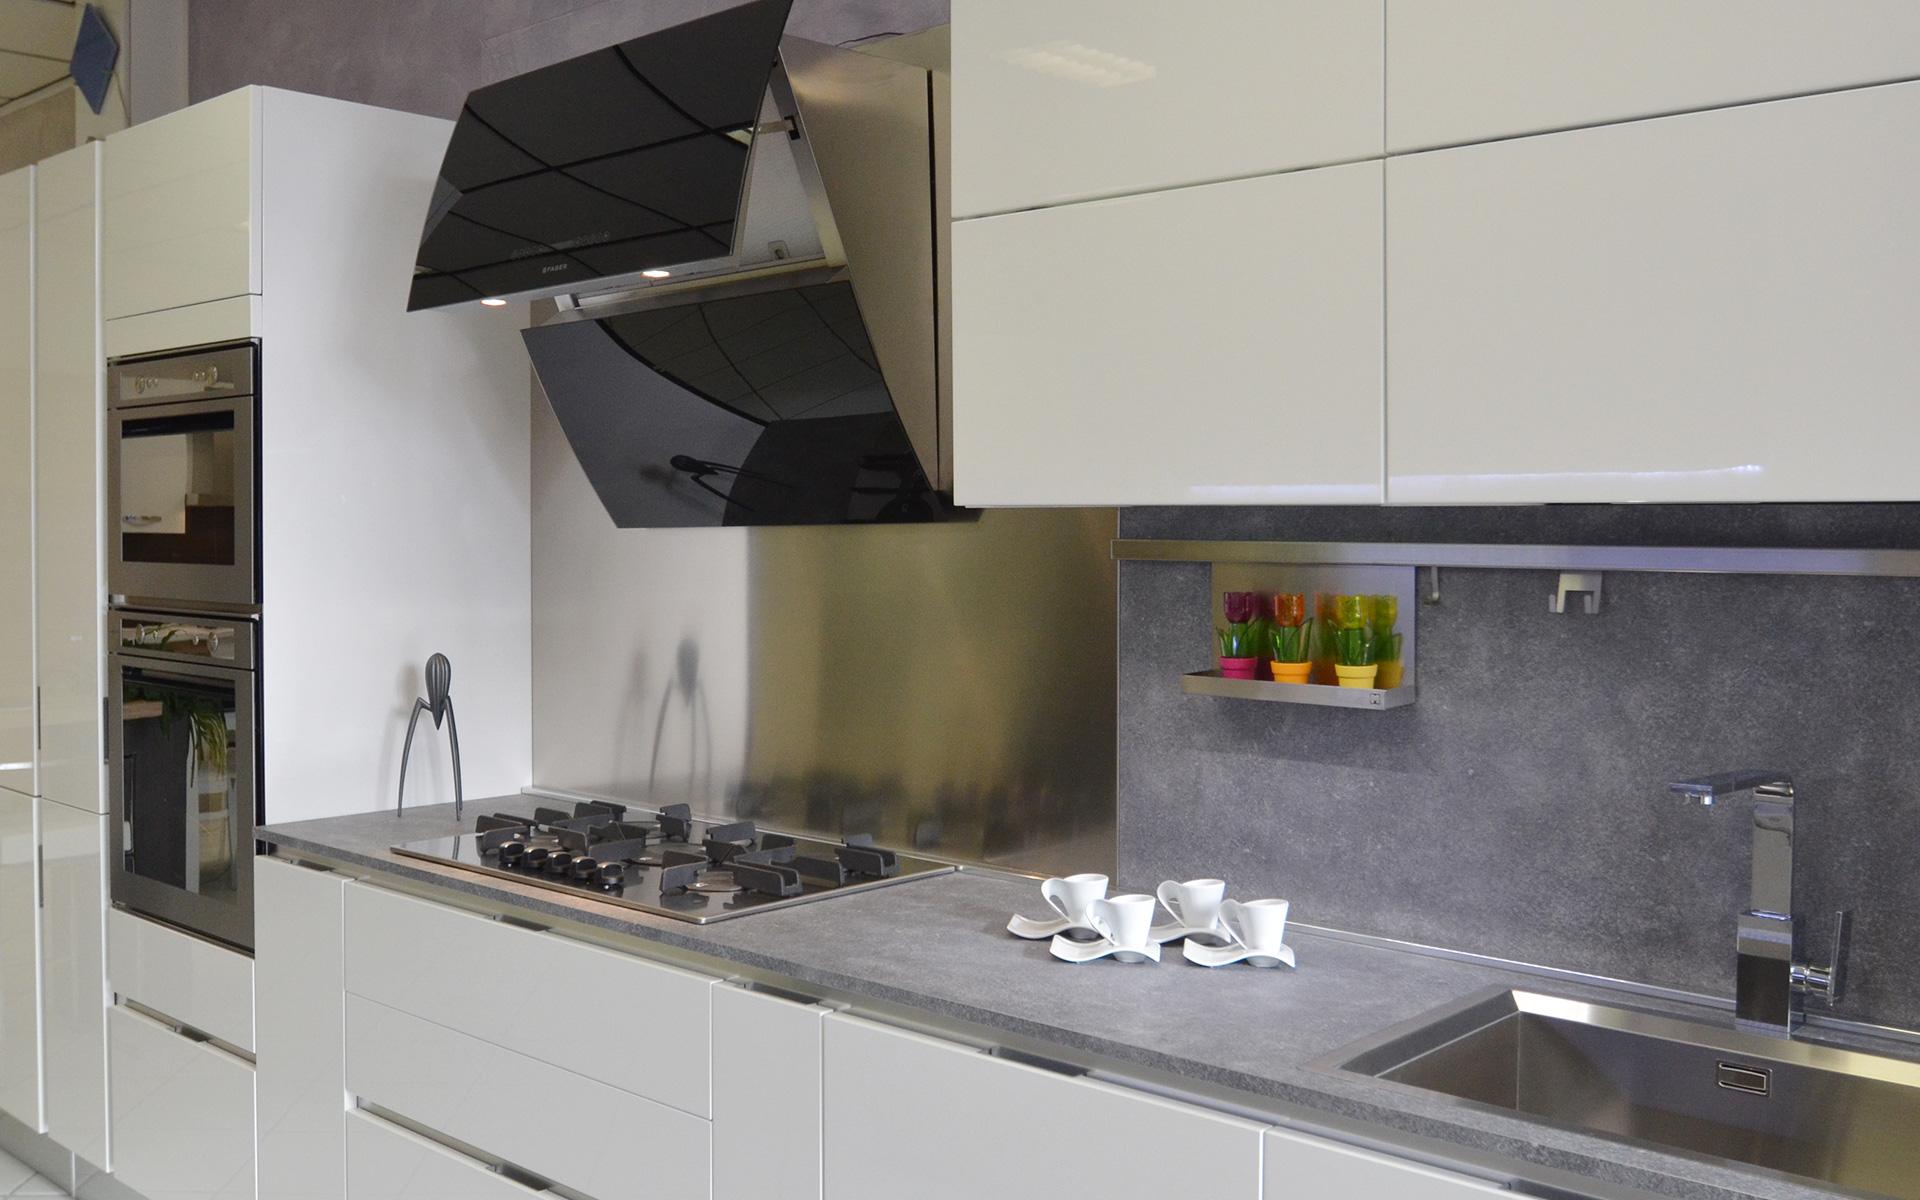 Tubo Per Cappa Cucina Design cappe aspiranti per cucine, lavelli, rubinetteria, accessori